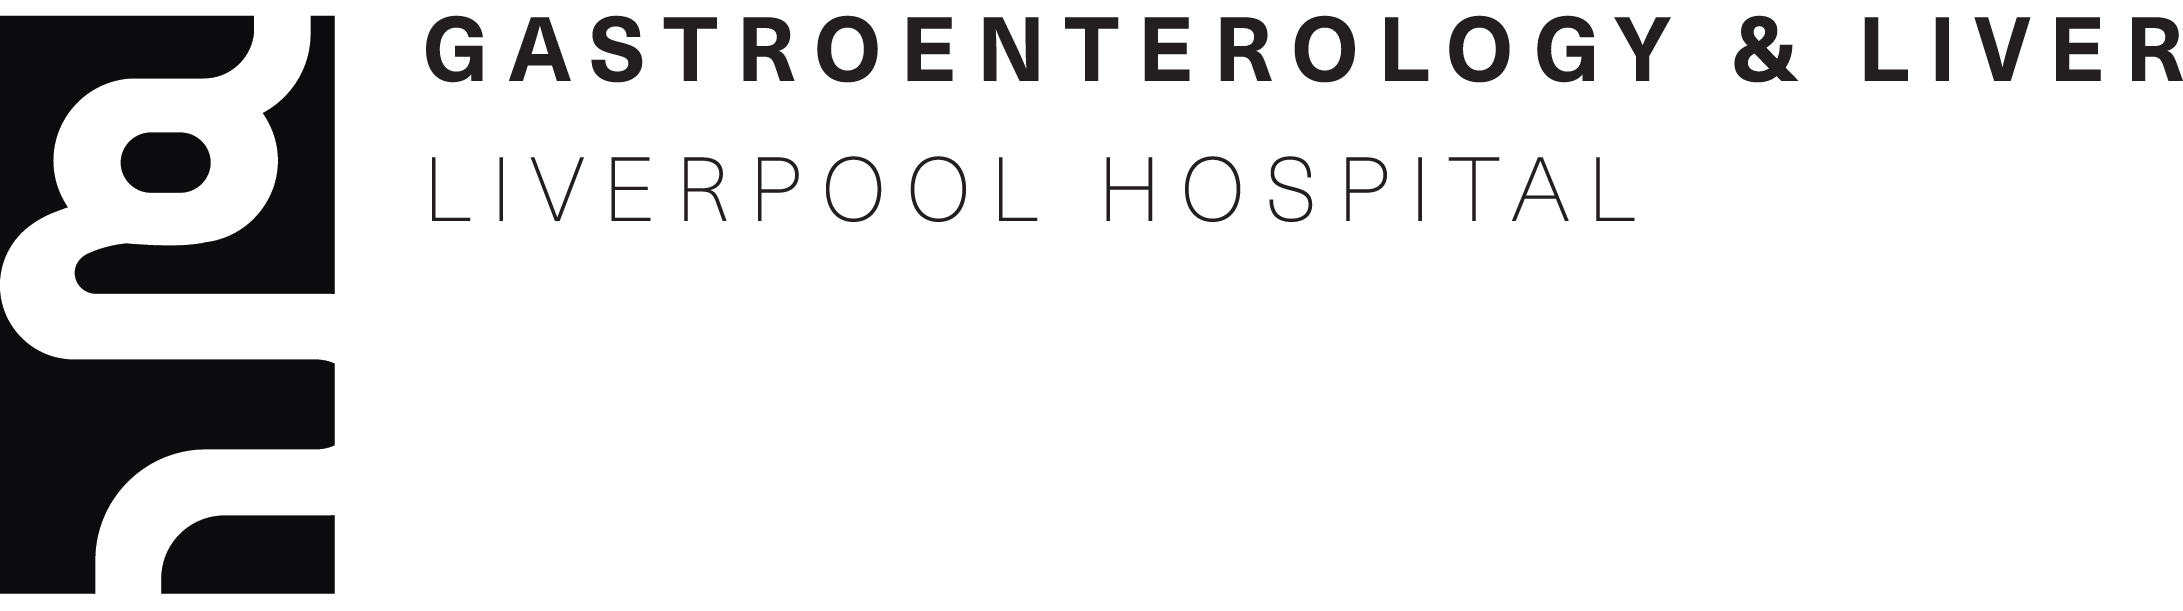 Dr Milan Bassan | Gastroenterology & Liver | Liverpool Hospital